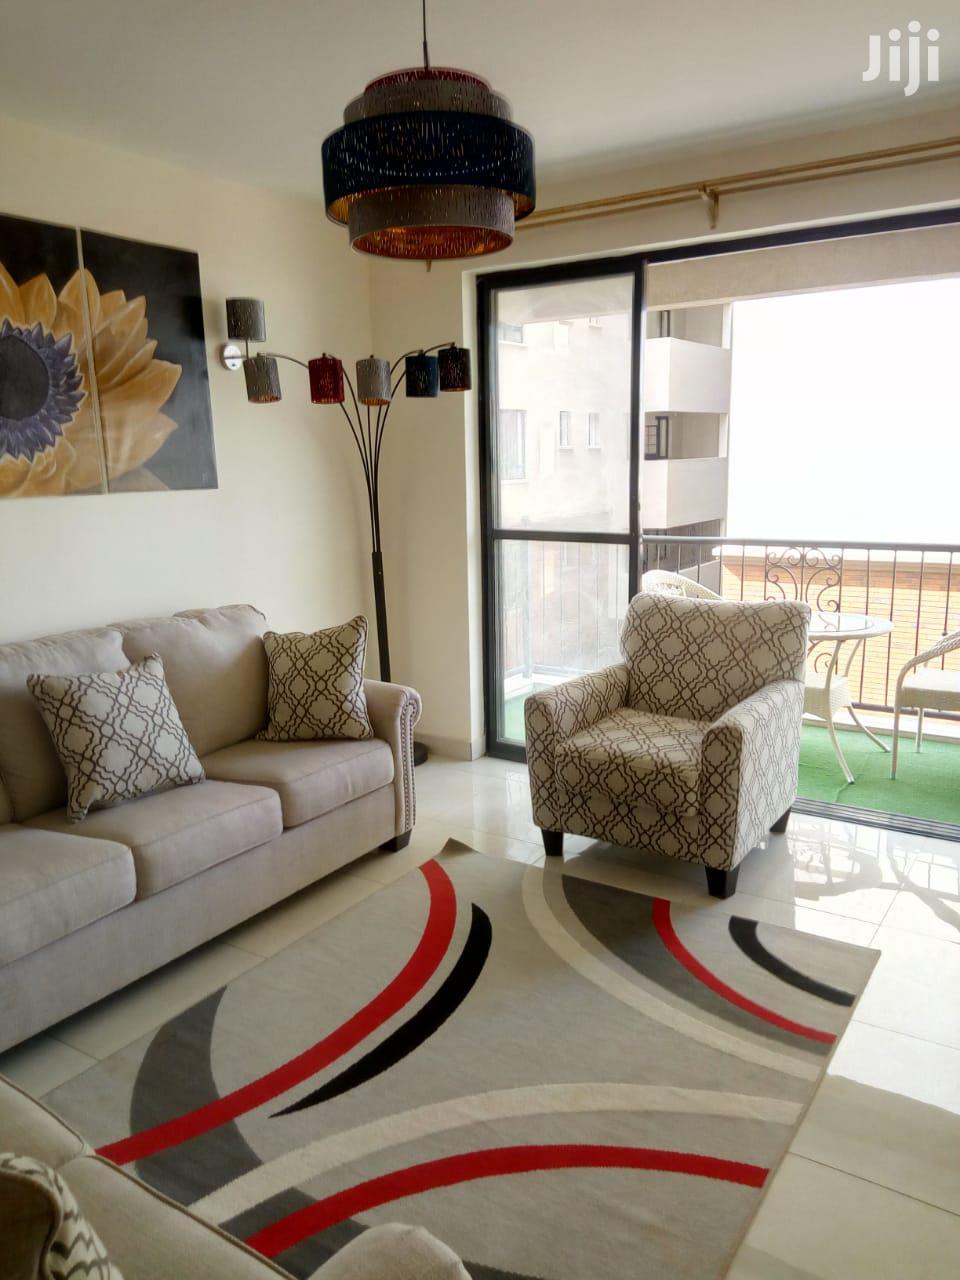 3 Bedrooms Apartment Off Mombasa Road | Houses & Apartments For Sale for sale in Syokimau/Mulolongo, Machakos, Kenya